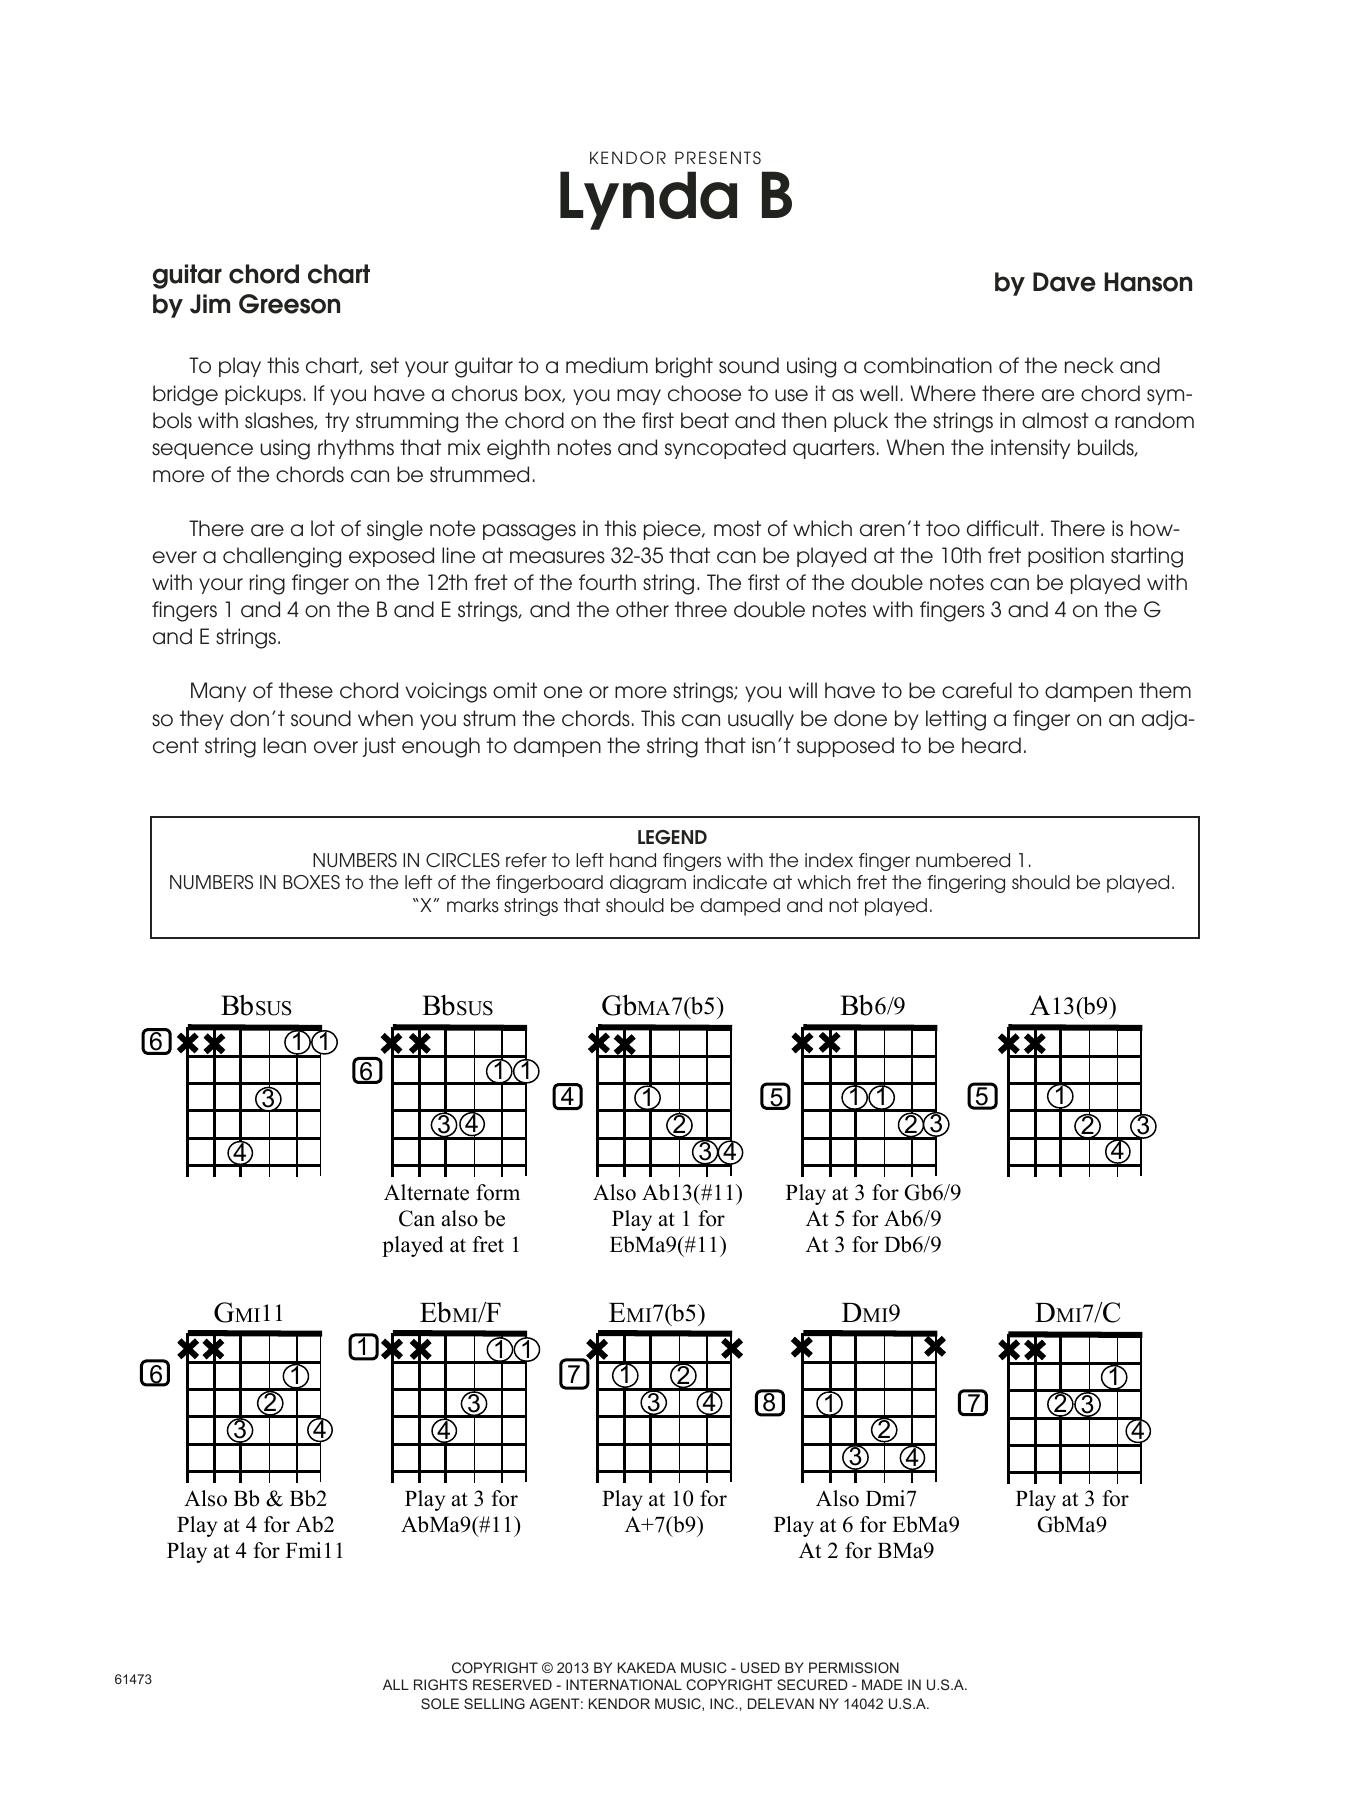 Lynda B - Guitar Chord Chart Sheet Music